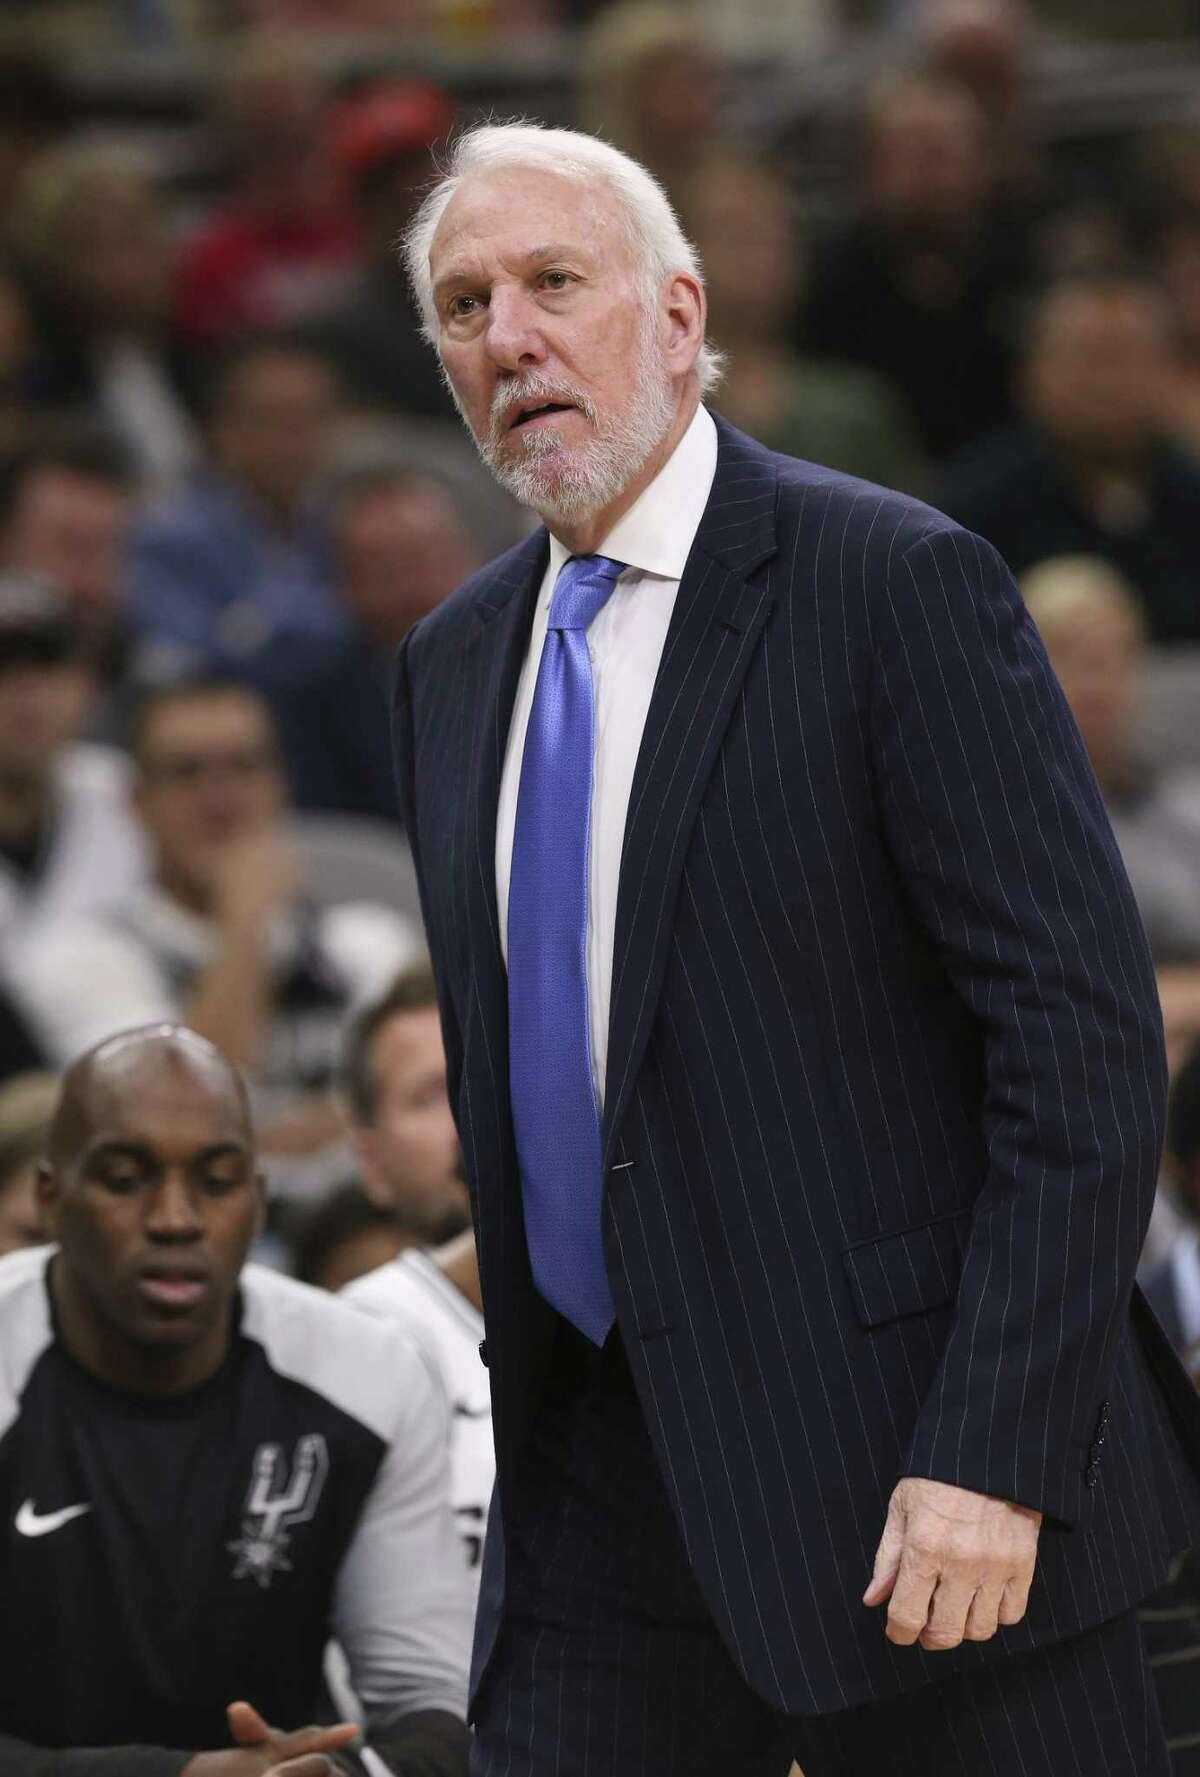 San Antonio Spurs?' head coach Gregg Popovich sported a Beto cap during practice on Nov. 2, 2018.